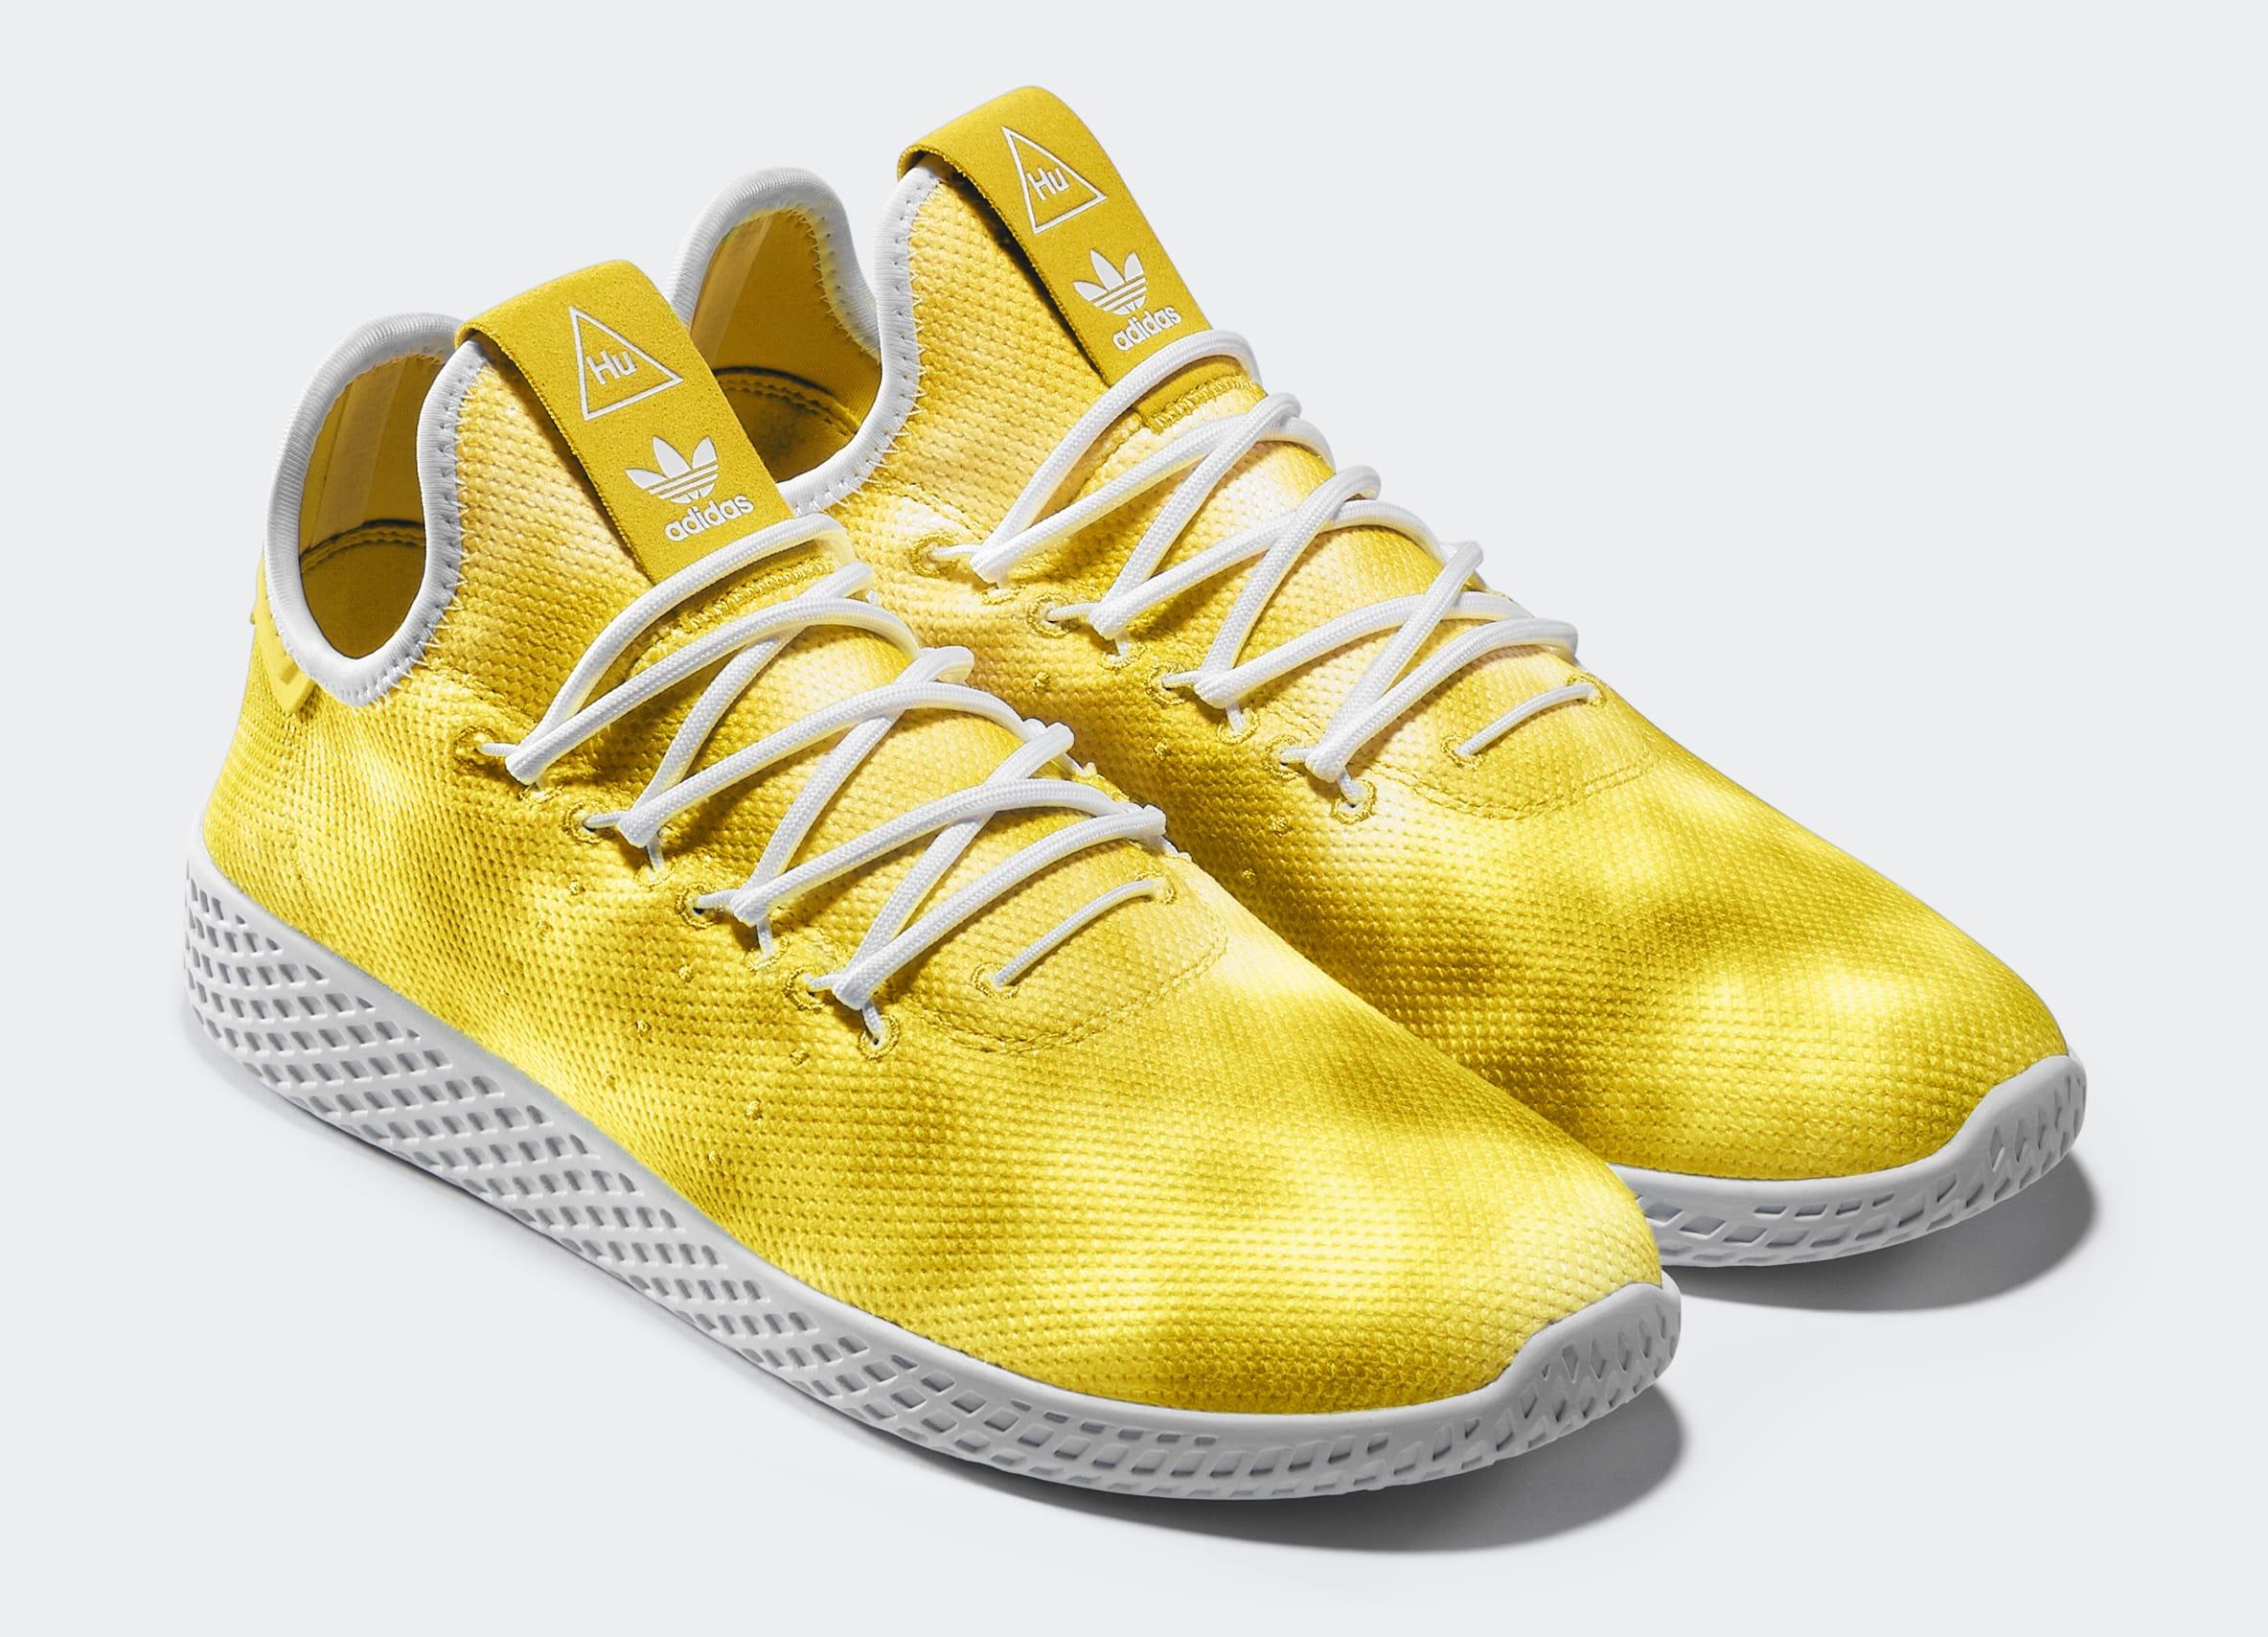 d9f10d84c ... Image via Adidas Pharrell x Adidas Tennis HU Holi DA9617 (Pair) ...